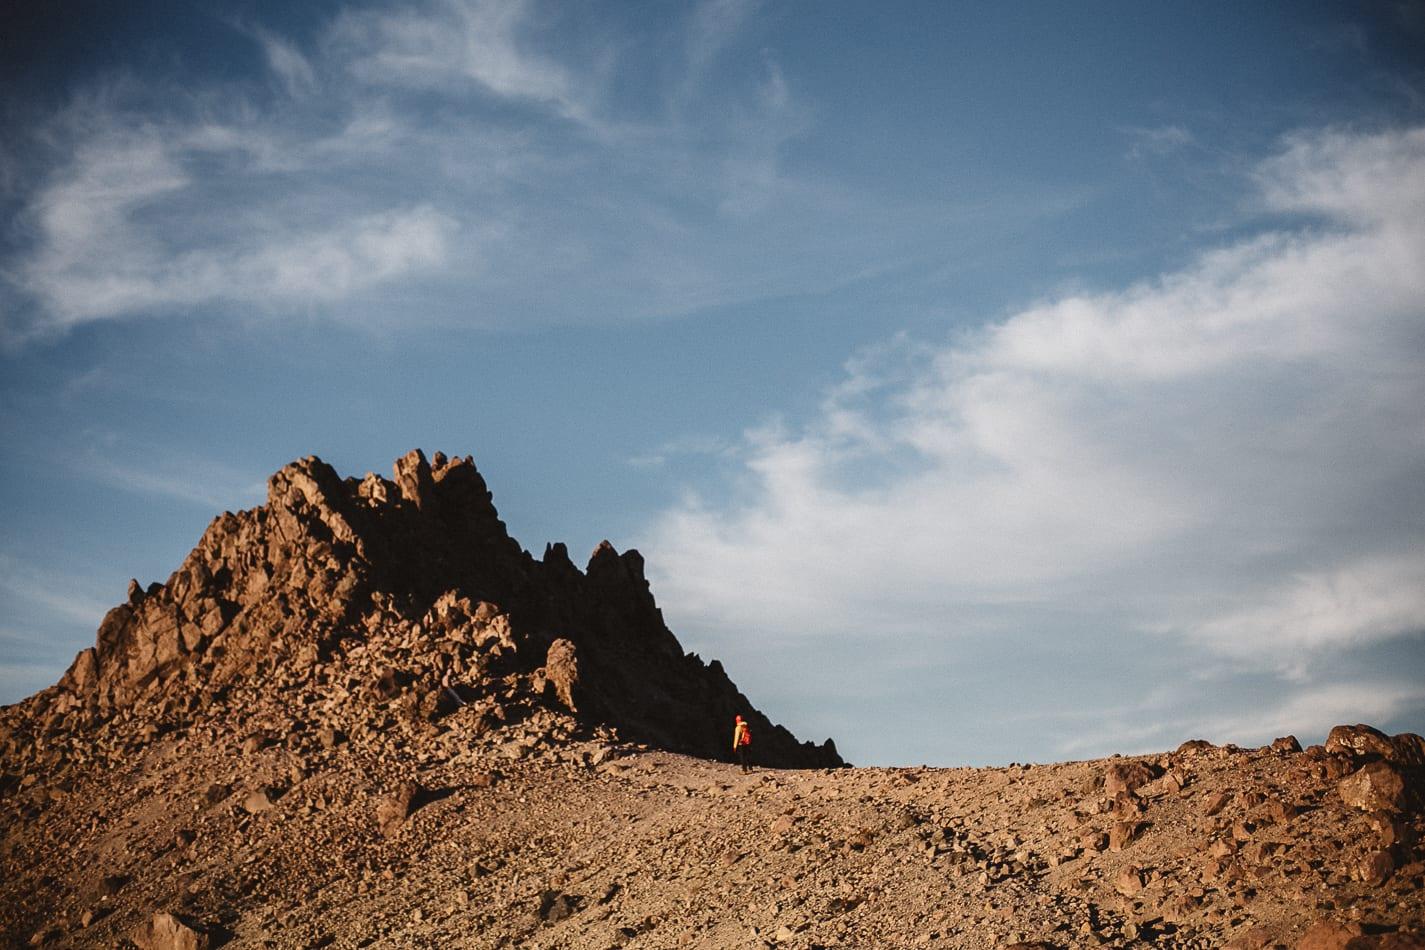 mount-lassen-california-adventure-lifestyle-photorapher-32